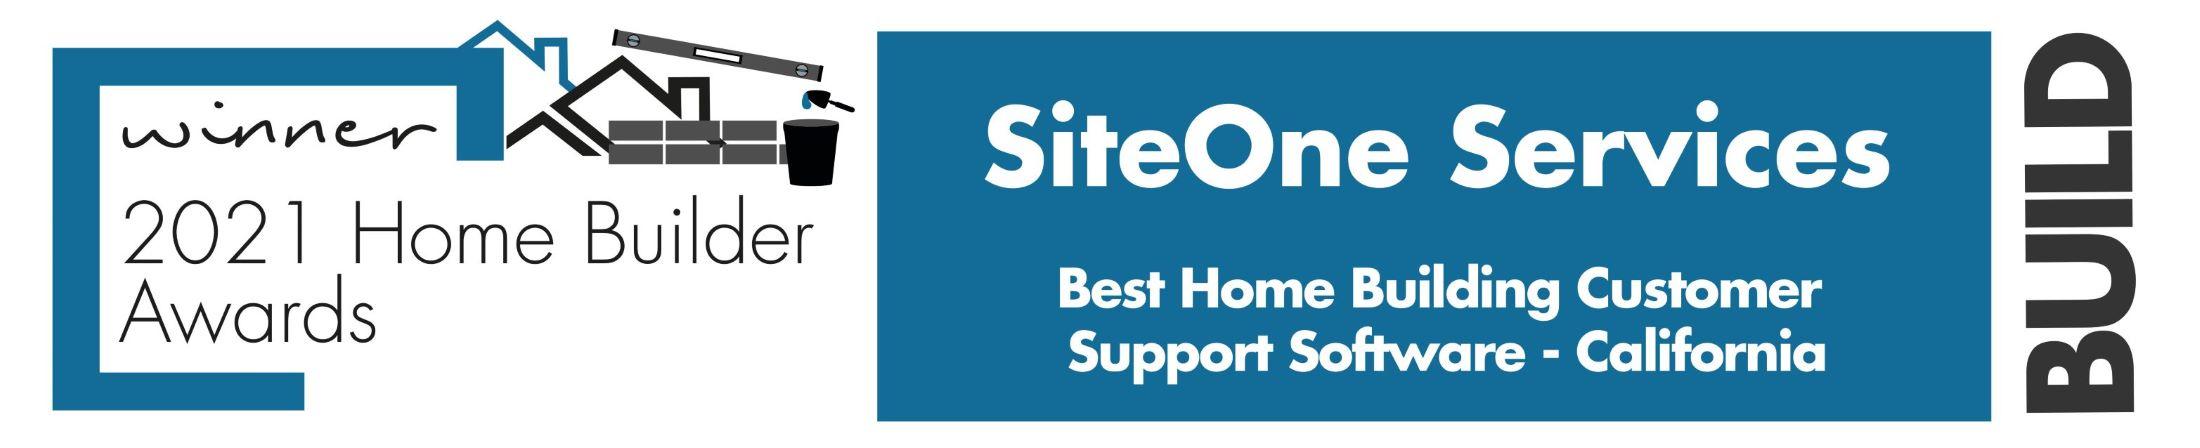 2021 Home Builder Winners Logo